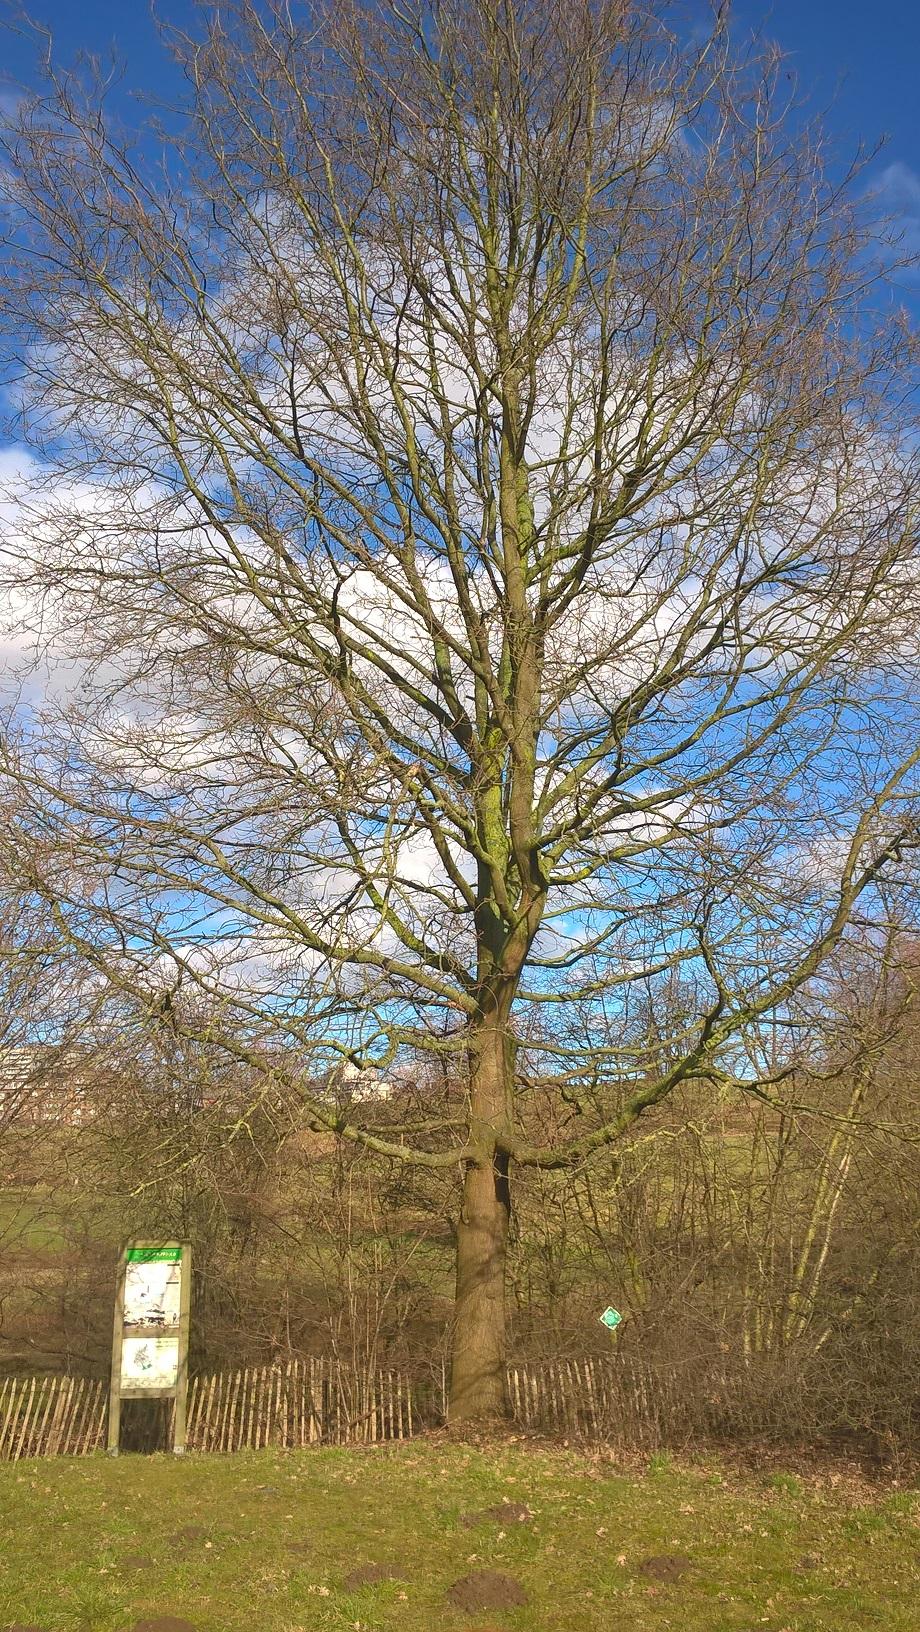 Chêne pédonculé – Berchem-Sainte-Agathe, Zavelenberg –  08 Mars 2018